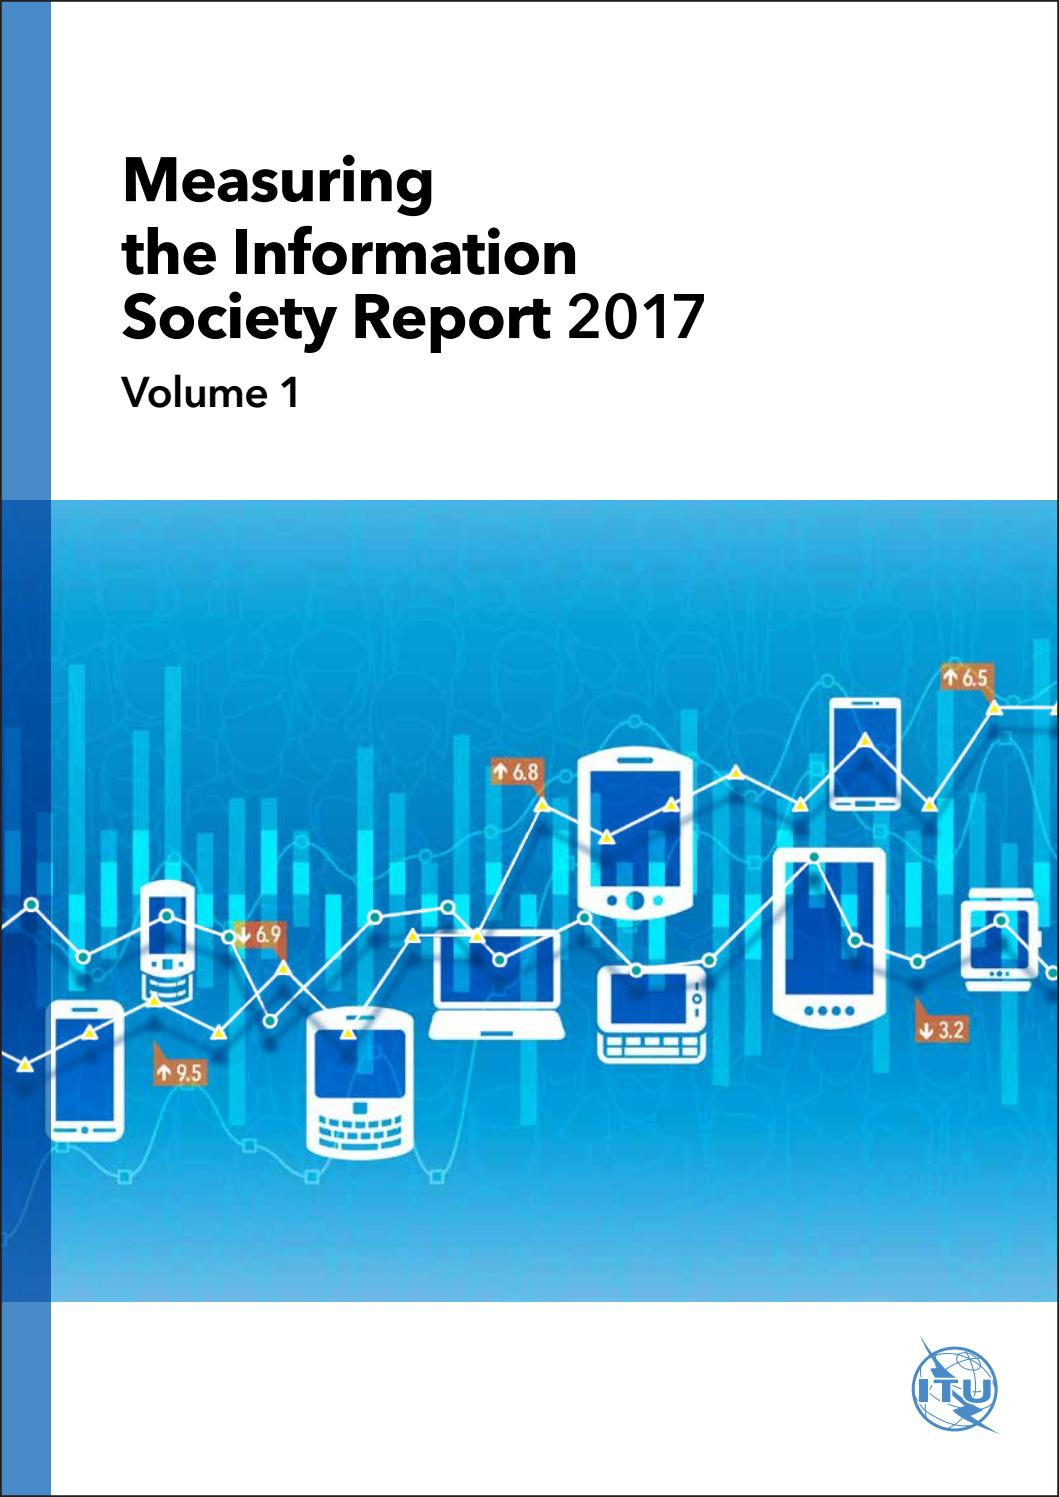 Misr2017 volume1 by الجمعية العلمية لمهندسى الاتصالات - issuu